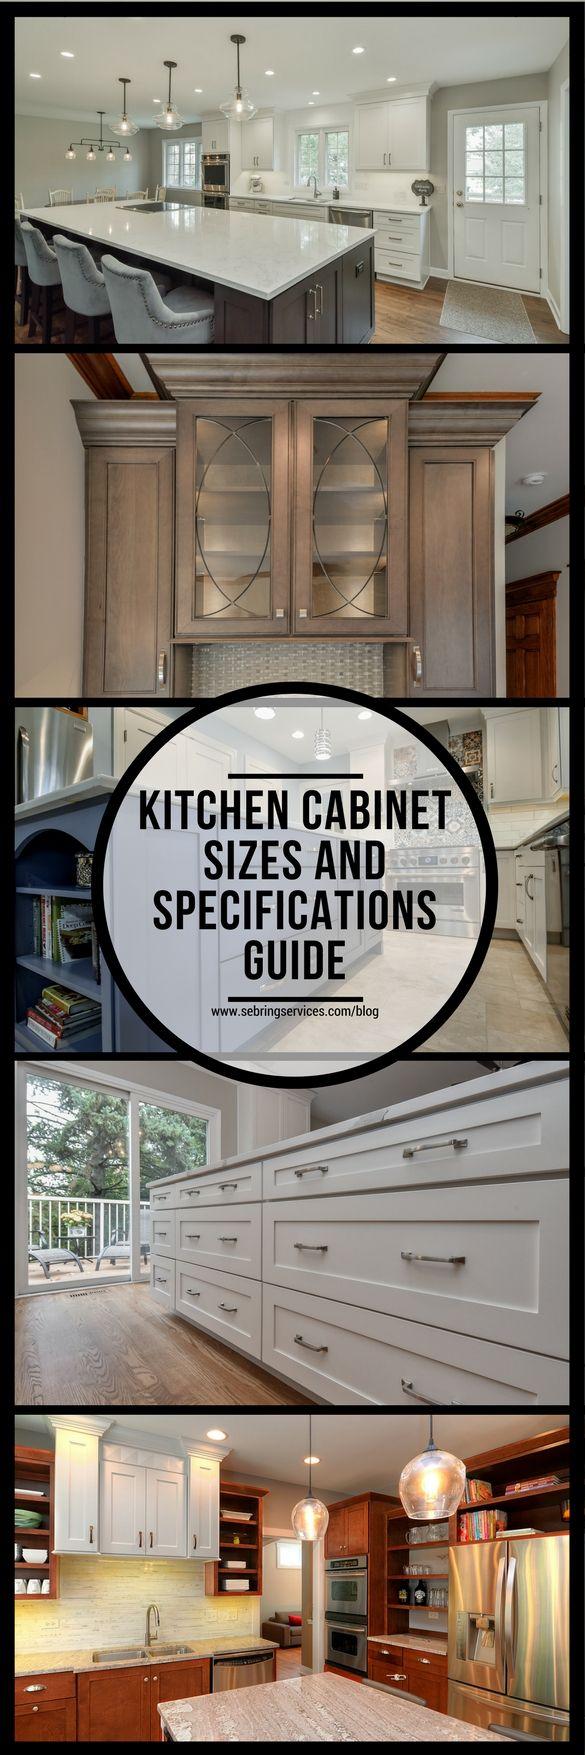 Best 25+ Kitchen cabinet sizes ideas on Pinterest | Ikea kitchen ...